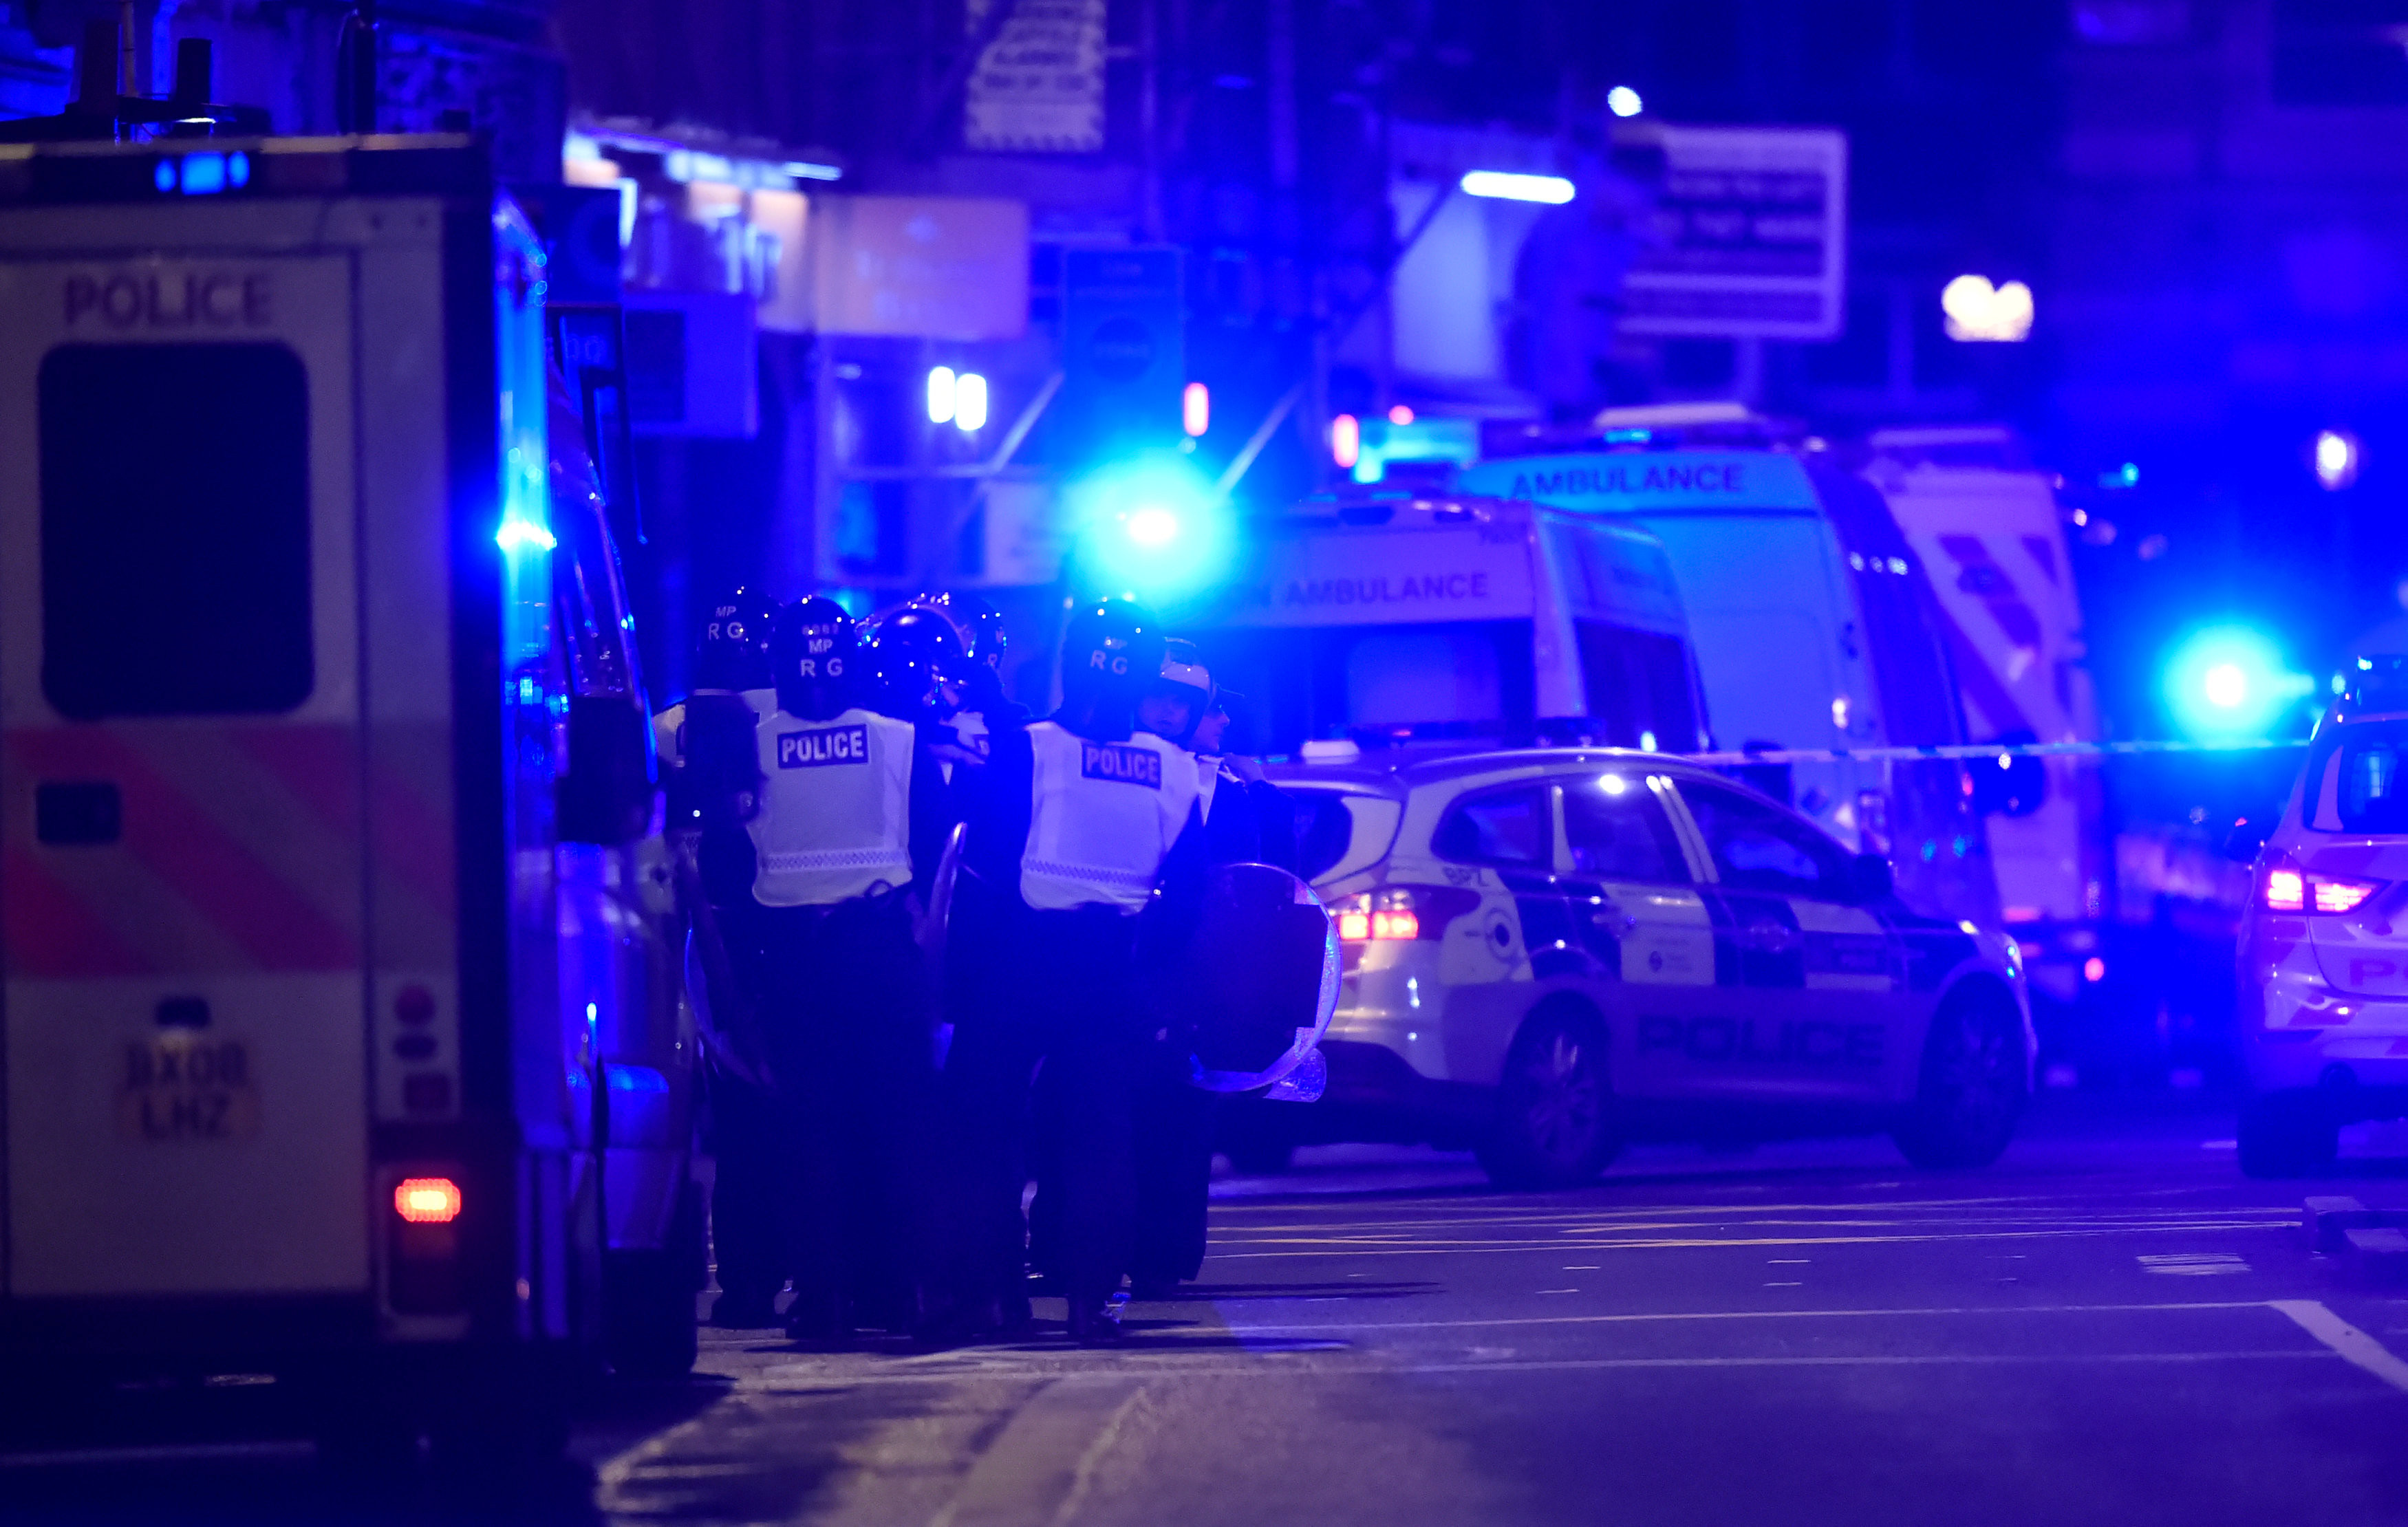 <p>В Лондоне произошла серия атак. Фото: &copy;&nbsp;<span>REUTERS/Hannah McKay</span></p>